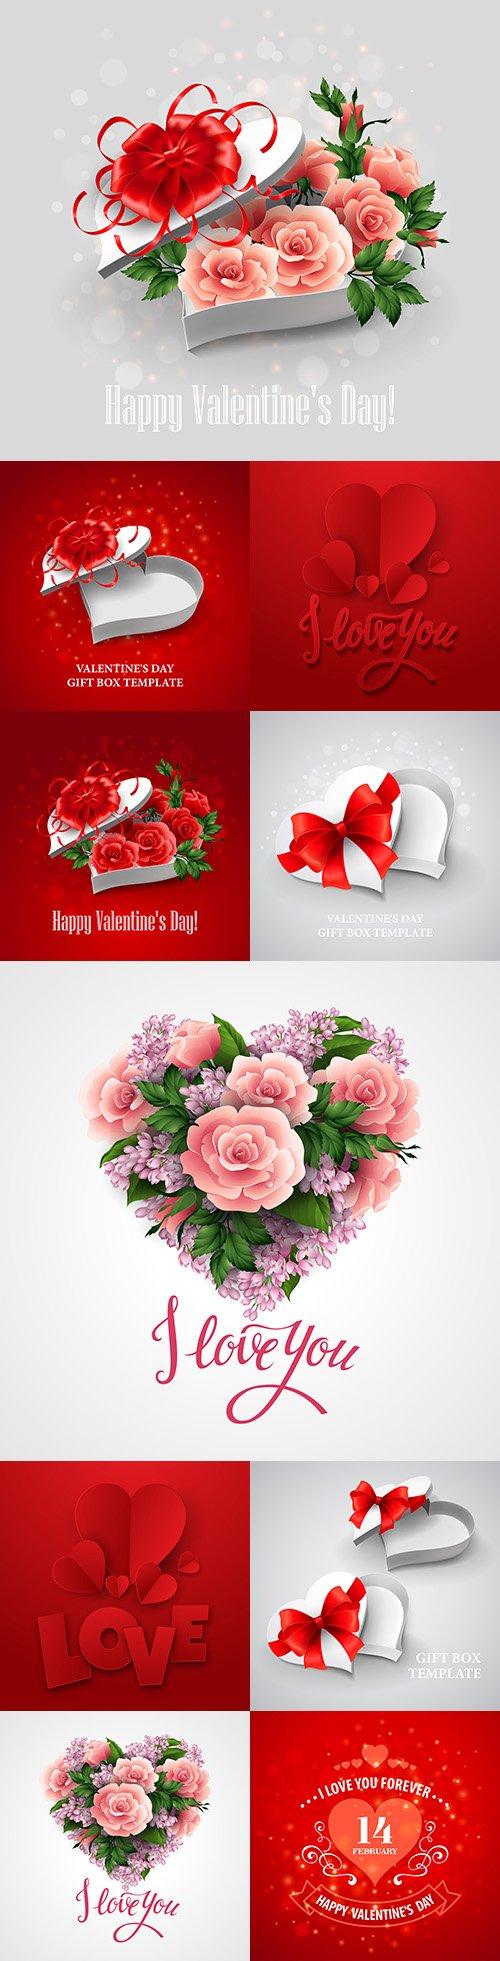 Happy Valentine's Day romantic decorative illustrations 33